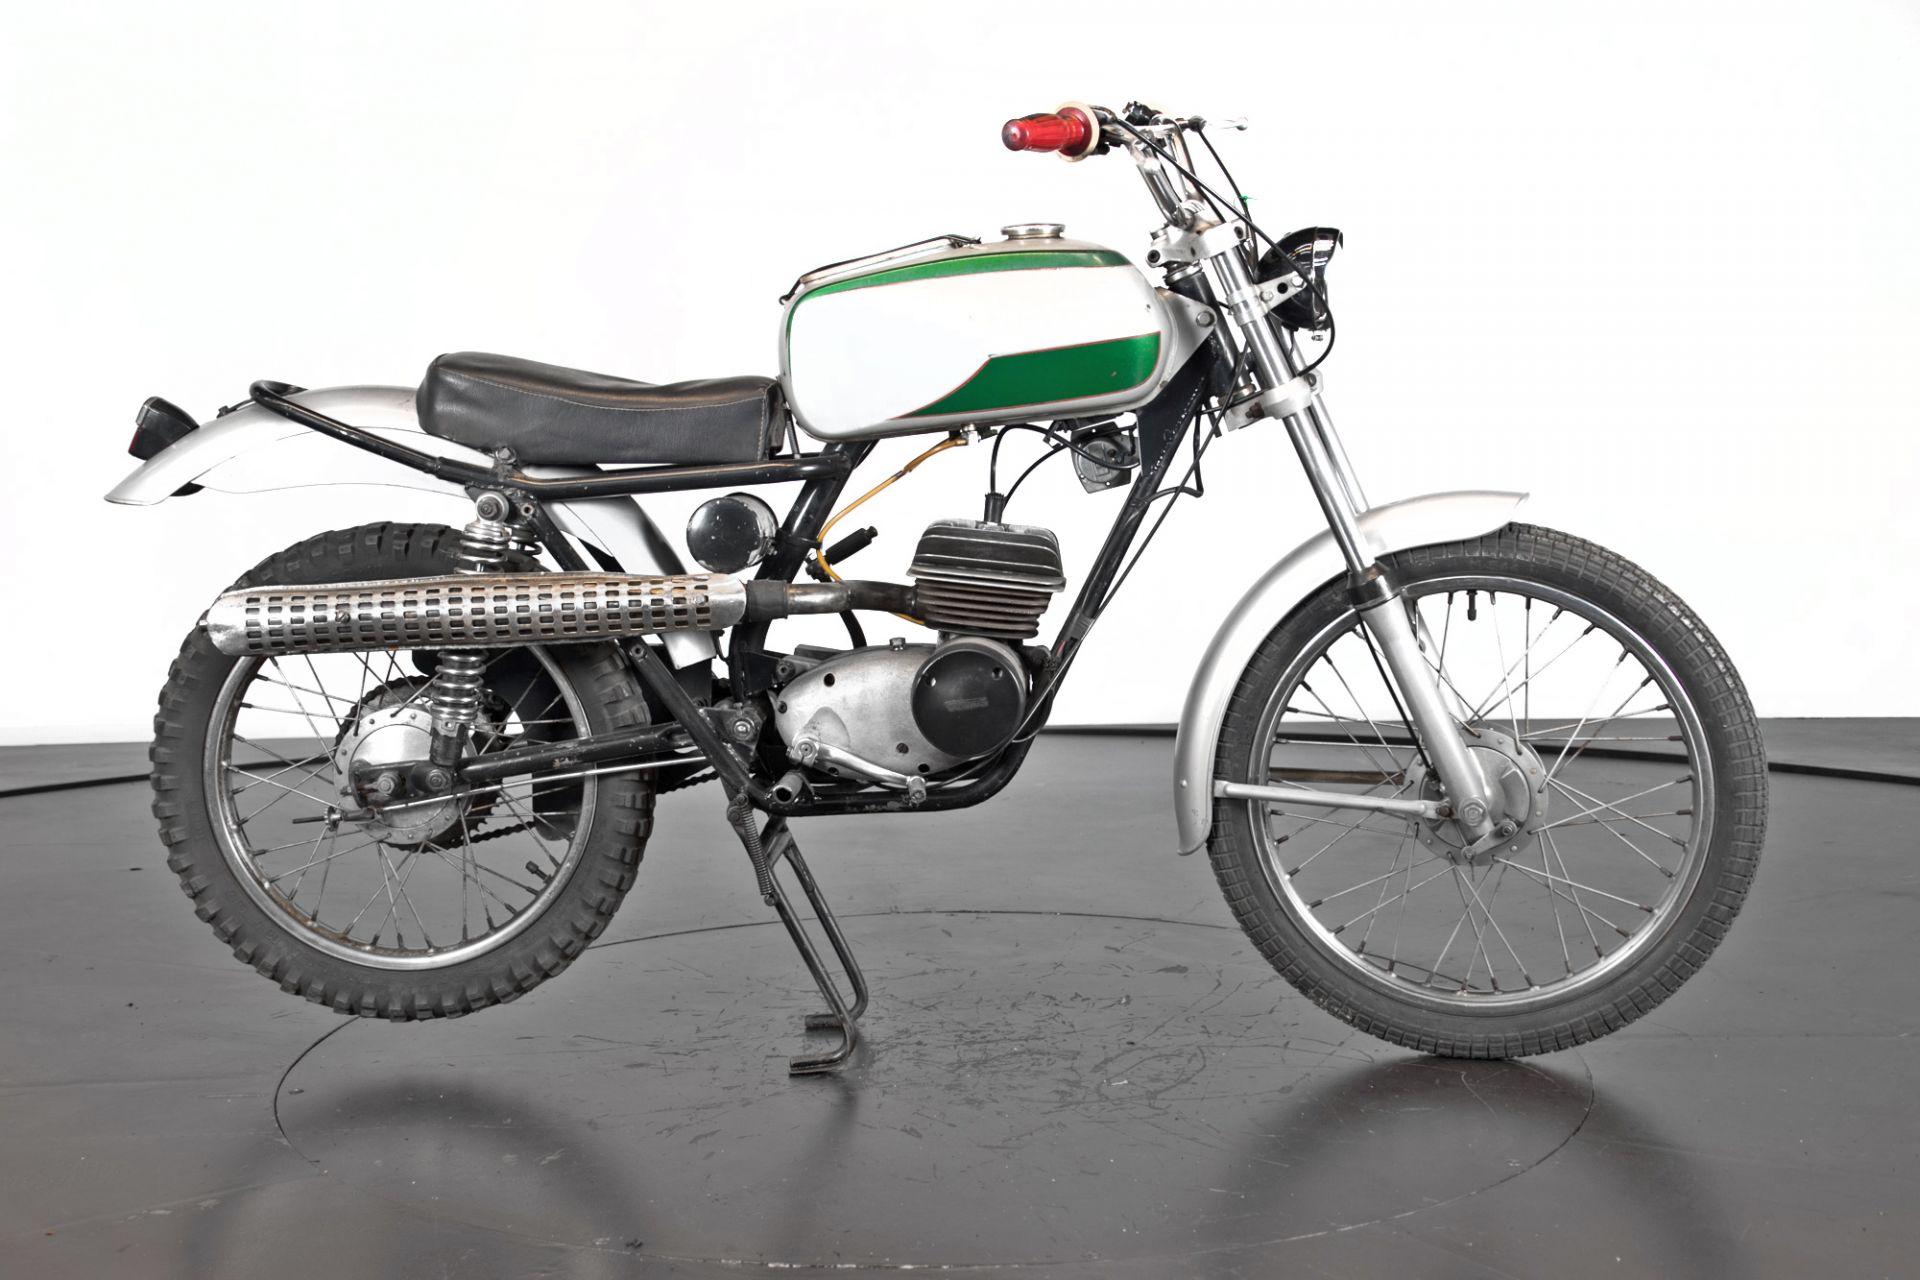 1974 Guazzoni Matta Cross 50 35947